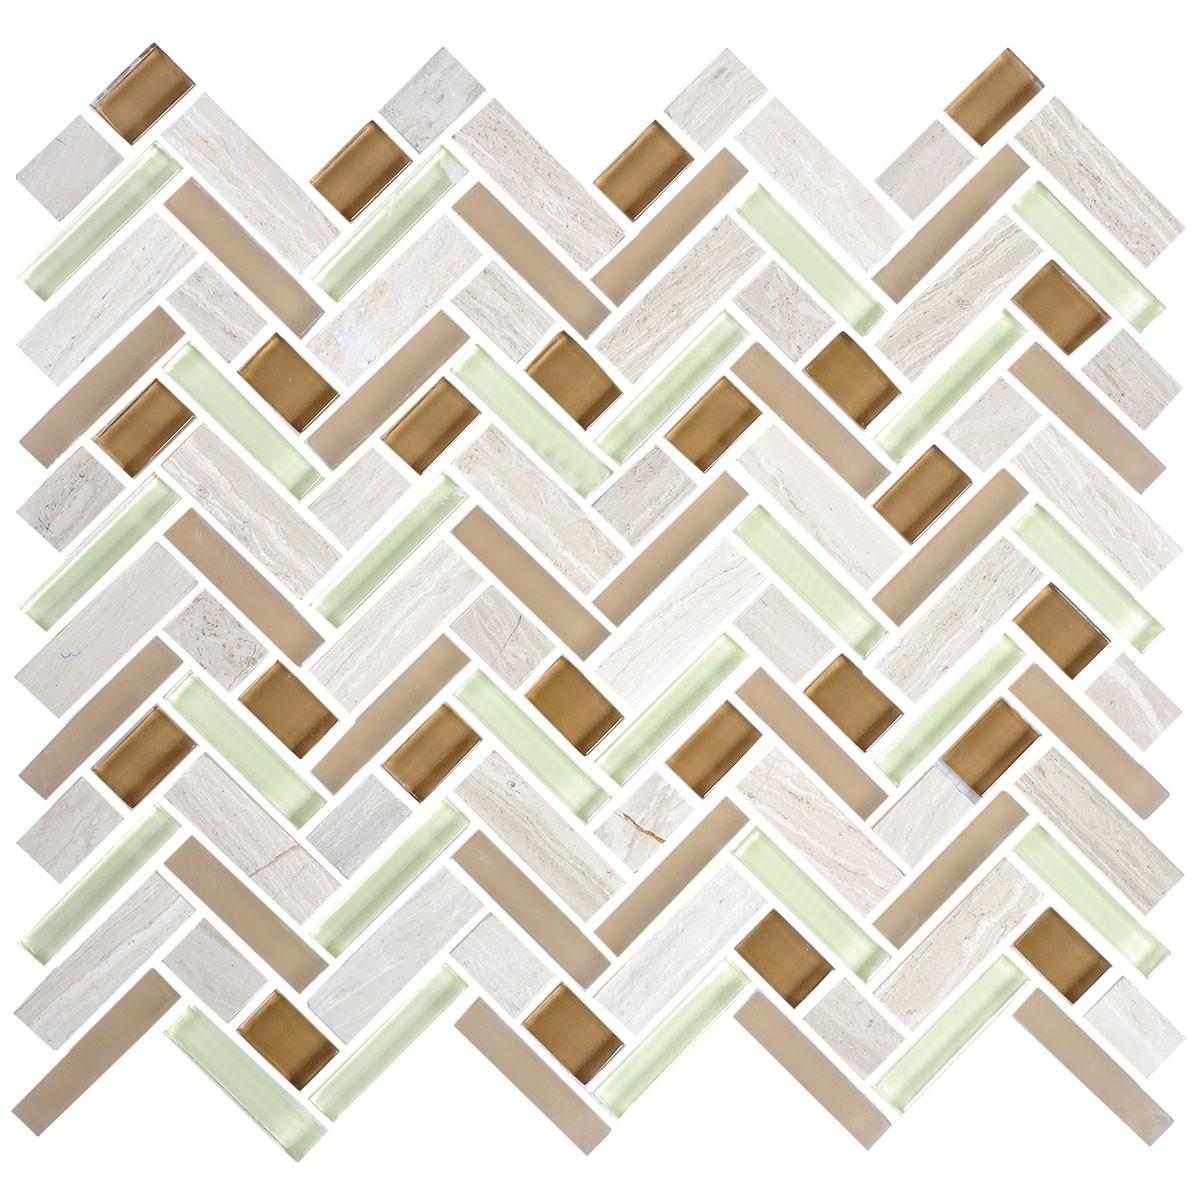 12 po x 12 po carreau mosa que de verre lectrolytique en. Black Bedroom Furniture Sets. Home Design Ideas